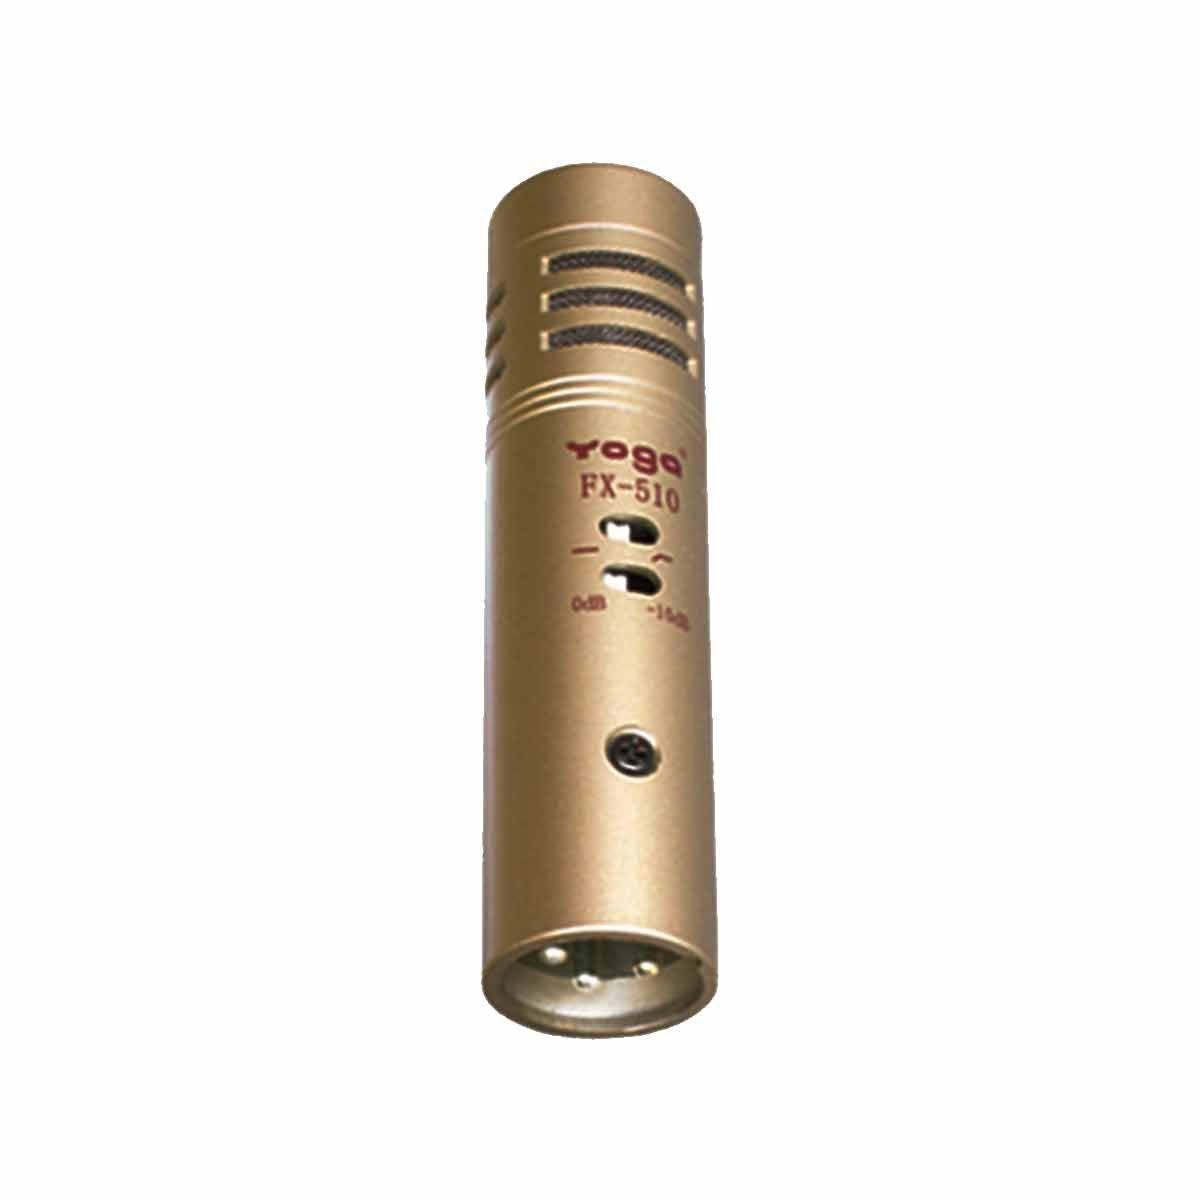 Microfone c/ Fio p/ Instrumentos / Pratos - FX 510 L Yoga